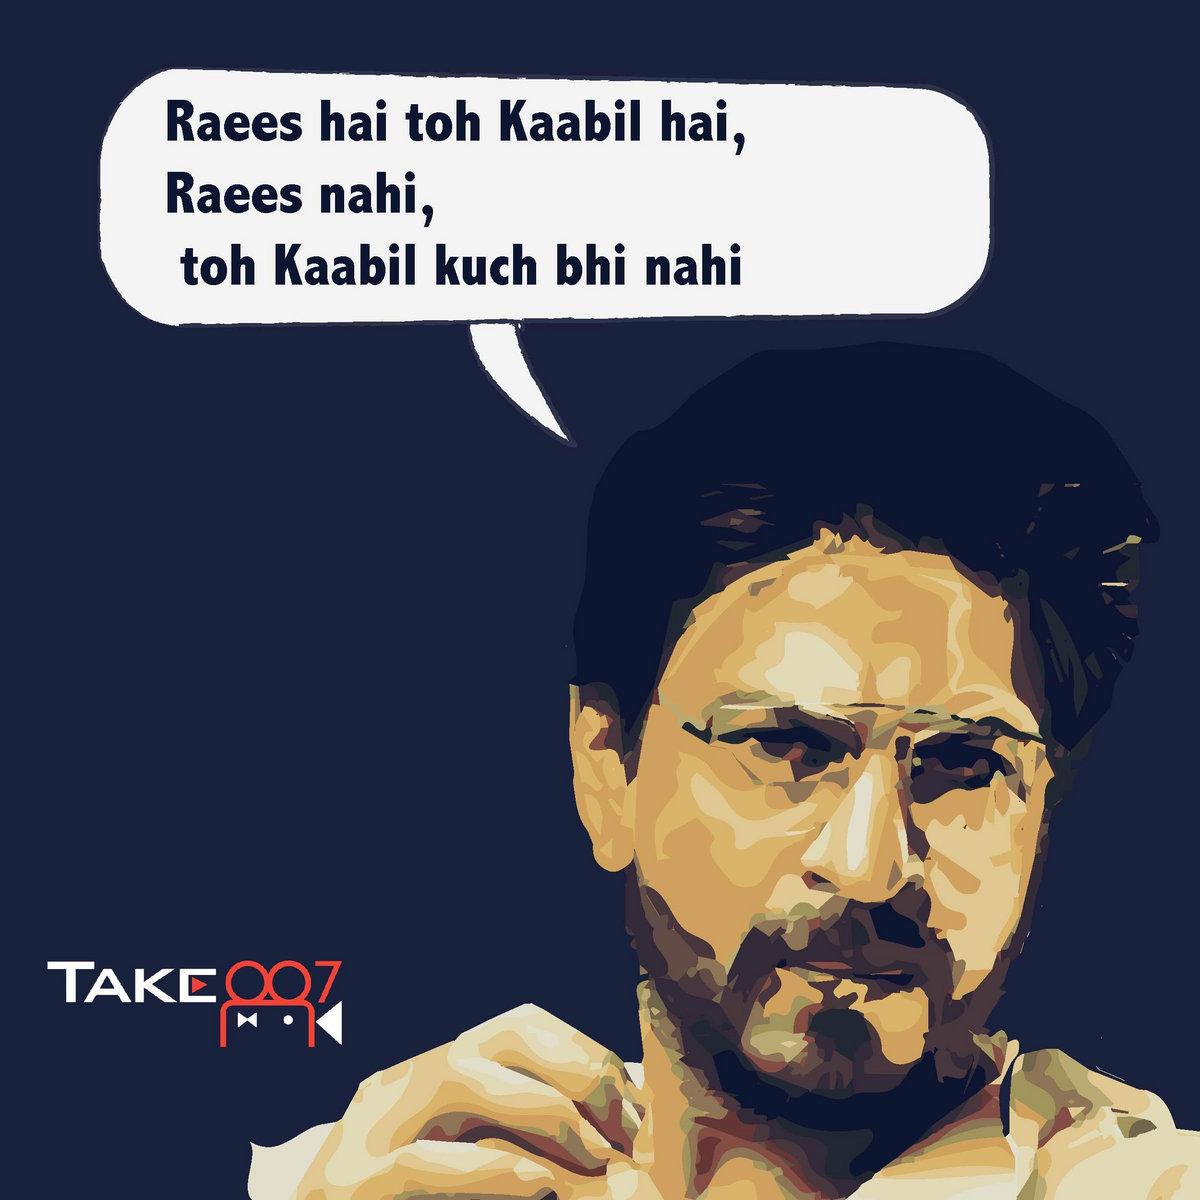 Vasool raja mbbs movie download kickass torrent by anfogavan issuu.